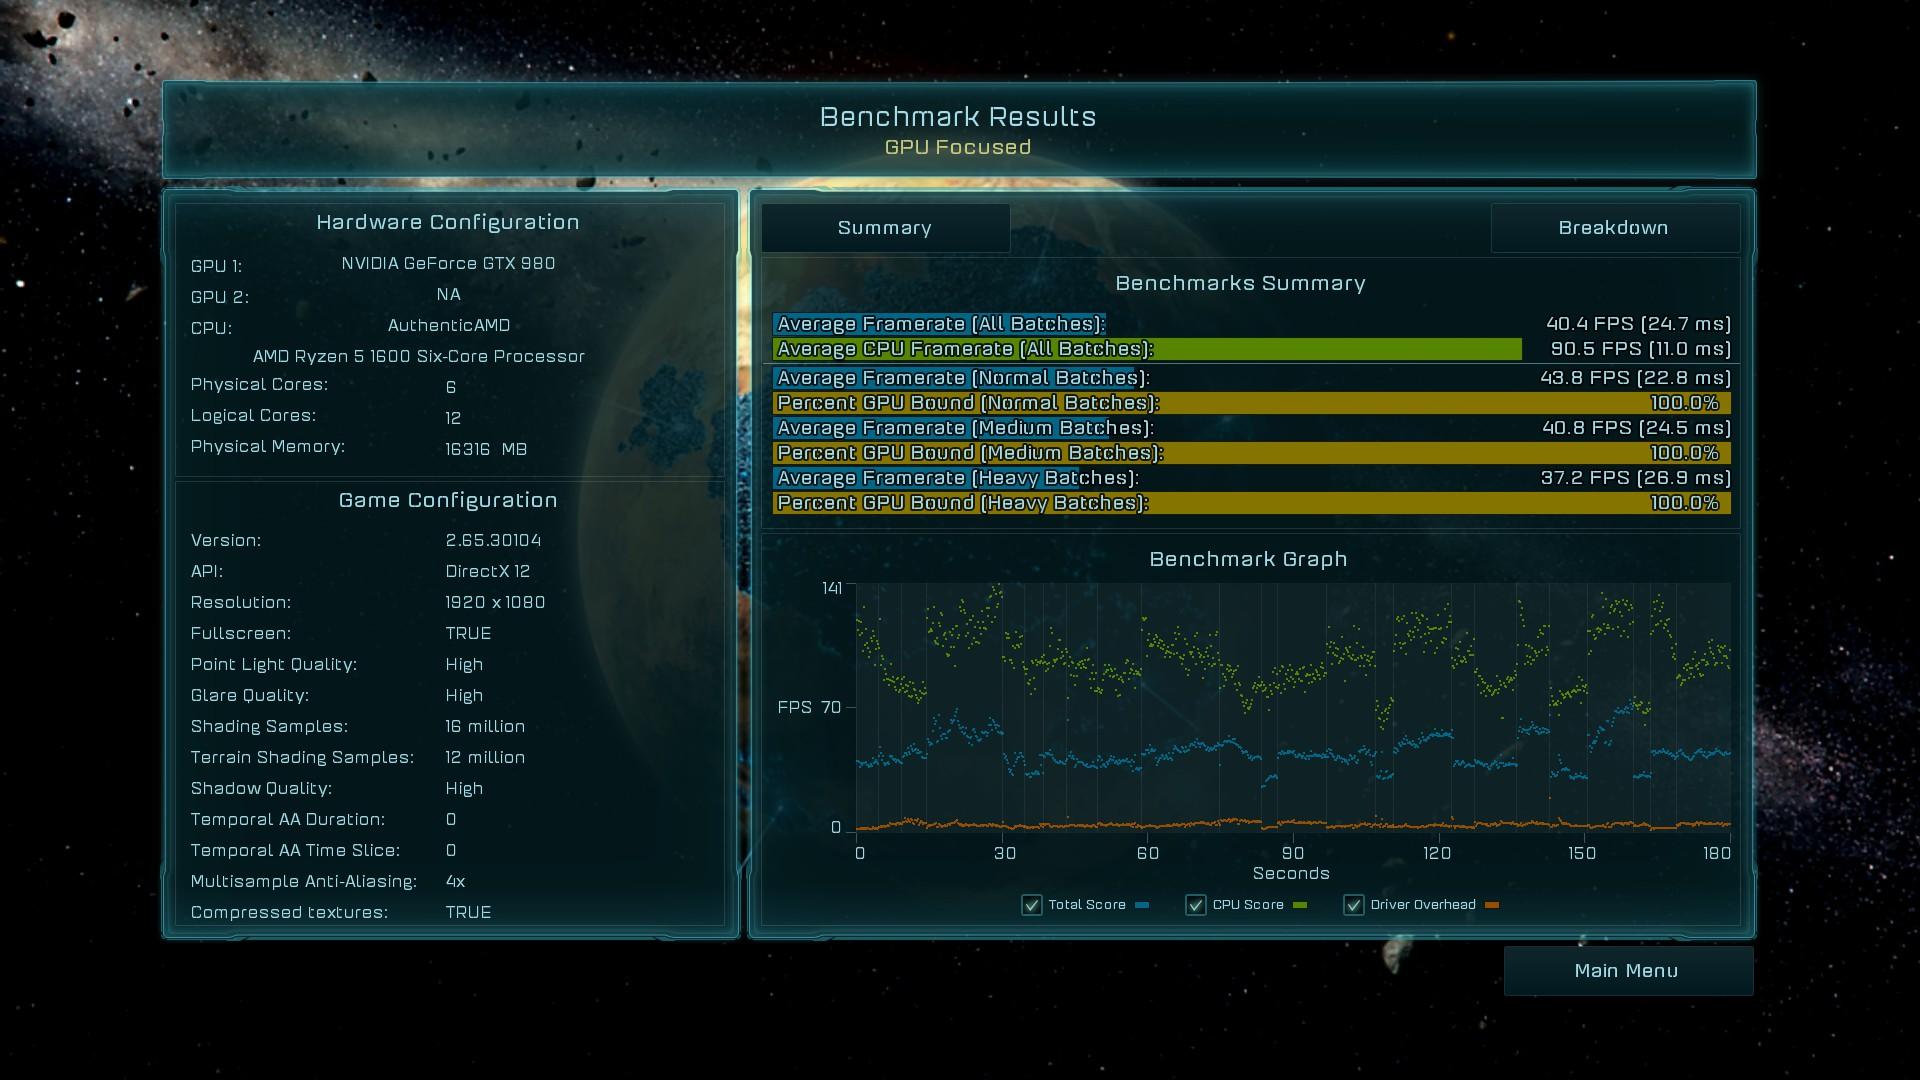 Ashes of the Singularity Escalation - 980 - 1080p - GPU focused